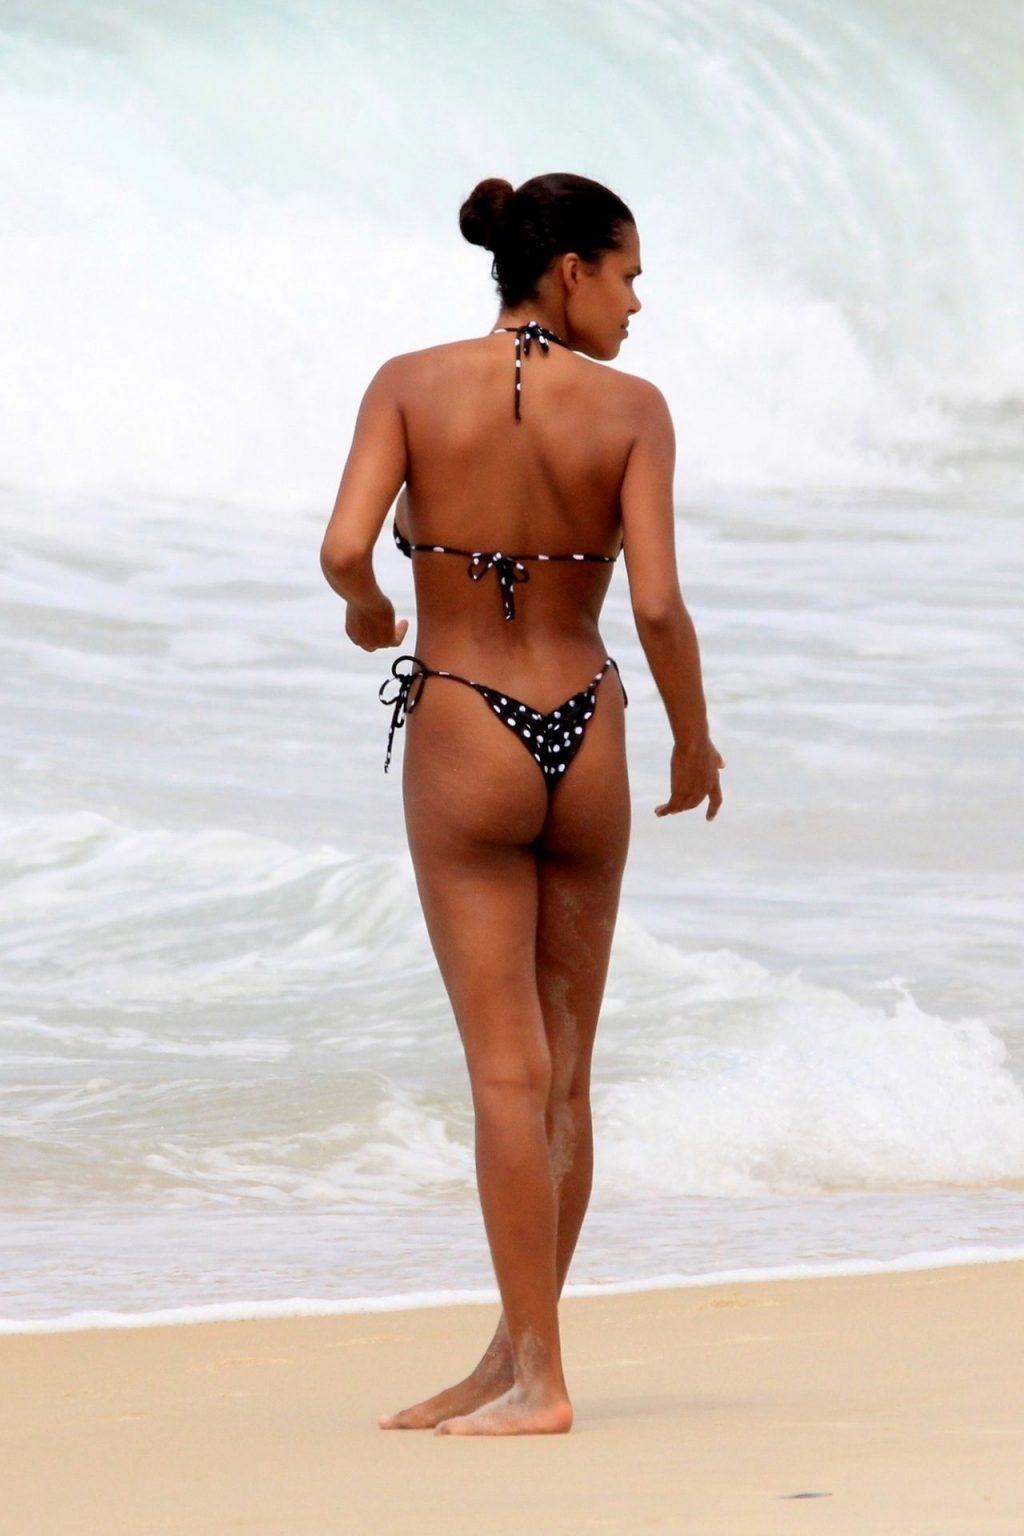 Tina Kunakey Nearly Nip Slip While Frolicking on the Beach in Rio (73 Photos)